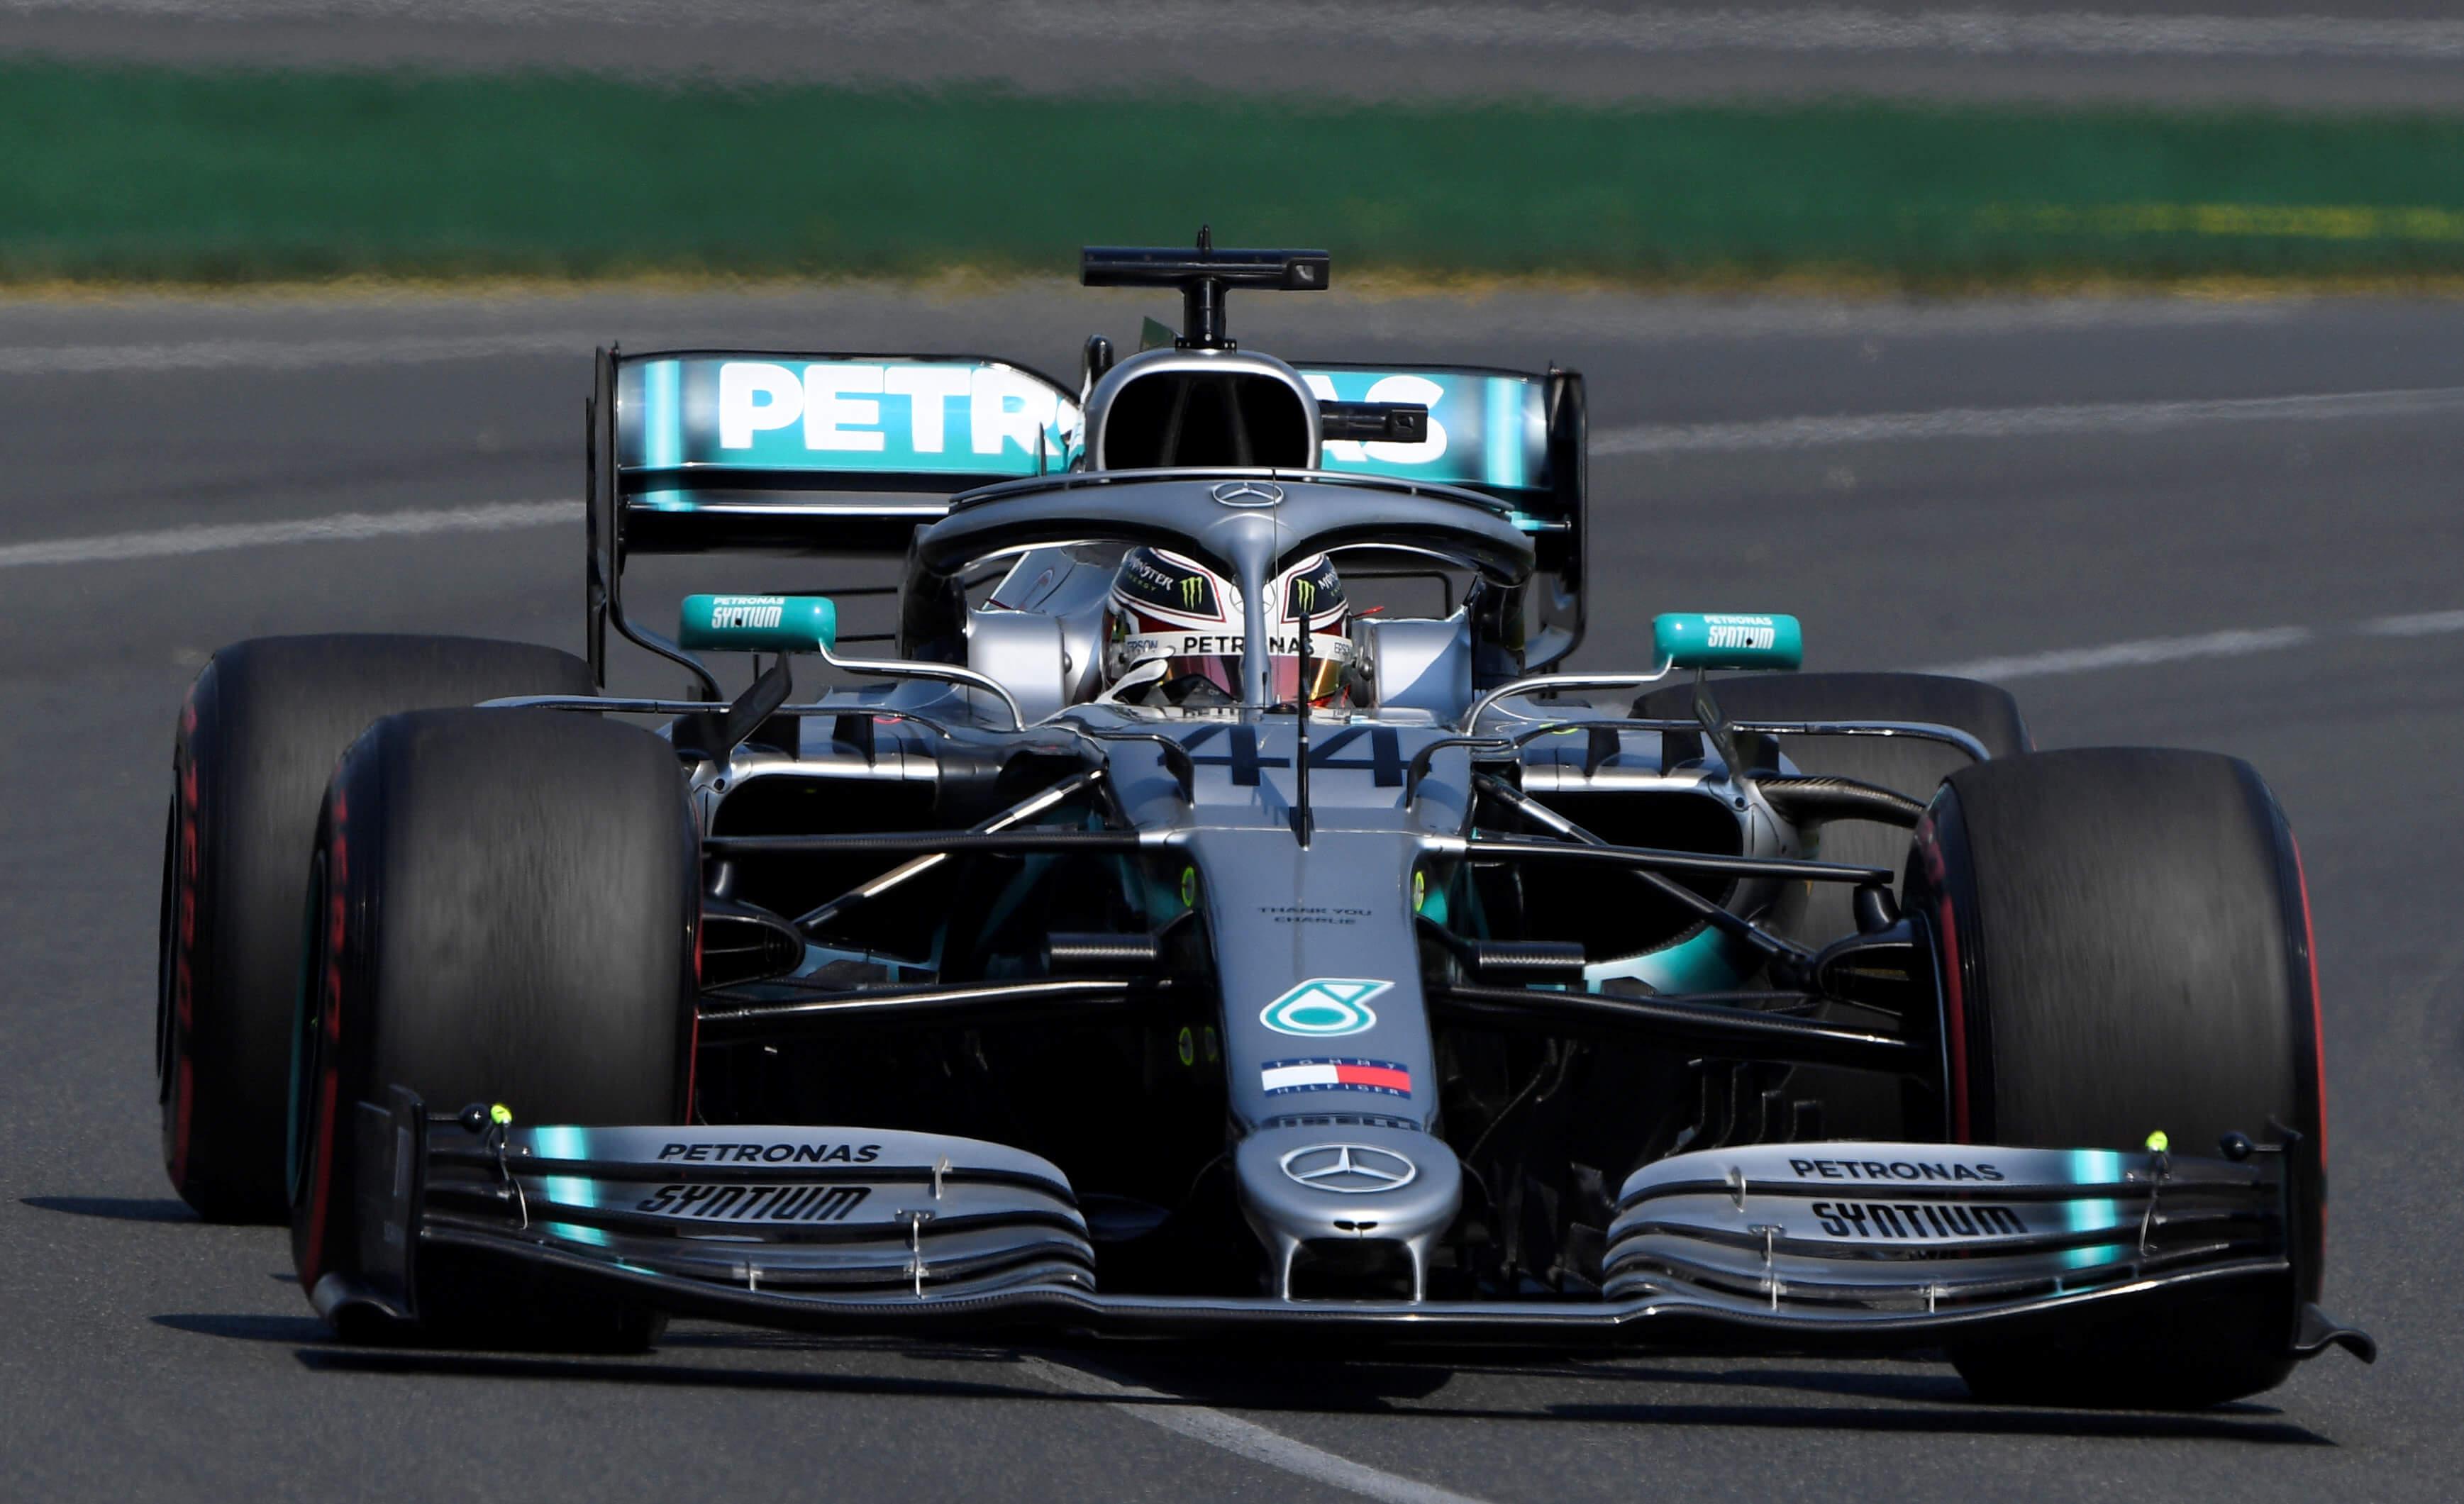 Formula 1: Πρώτος ο Φέτελ, αλλά νικητής ο Χάμιλτον! Τρομερός αγώνας στο Μόντρεαλ – video